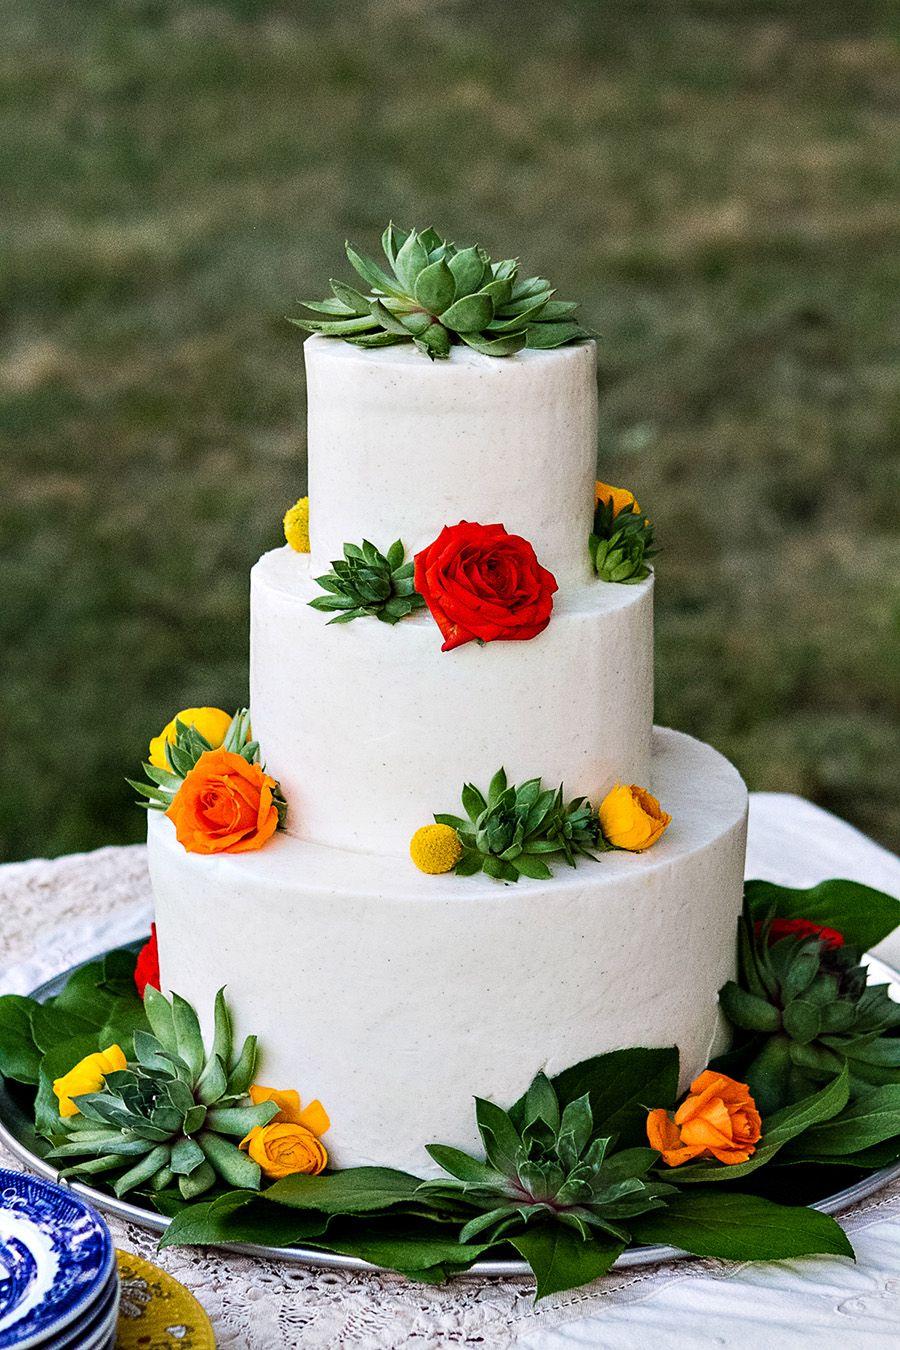 The most delicious vegan three-tiered cake. | Vegan Desserts ...